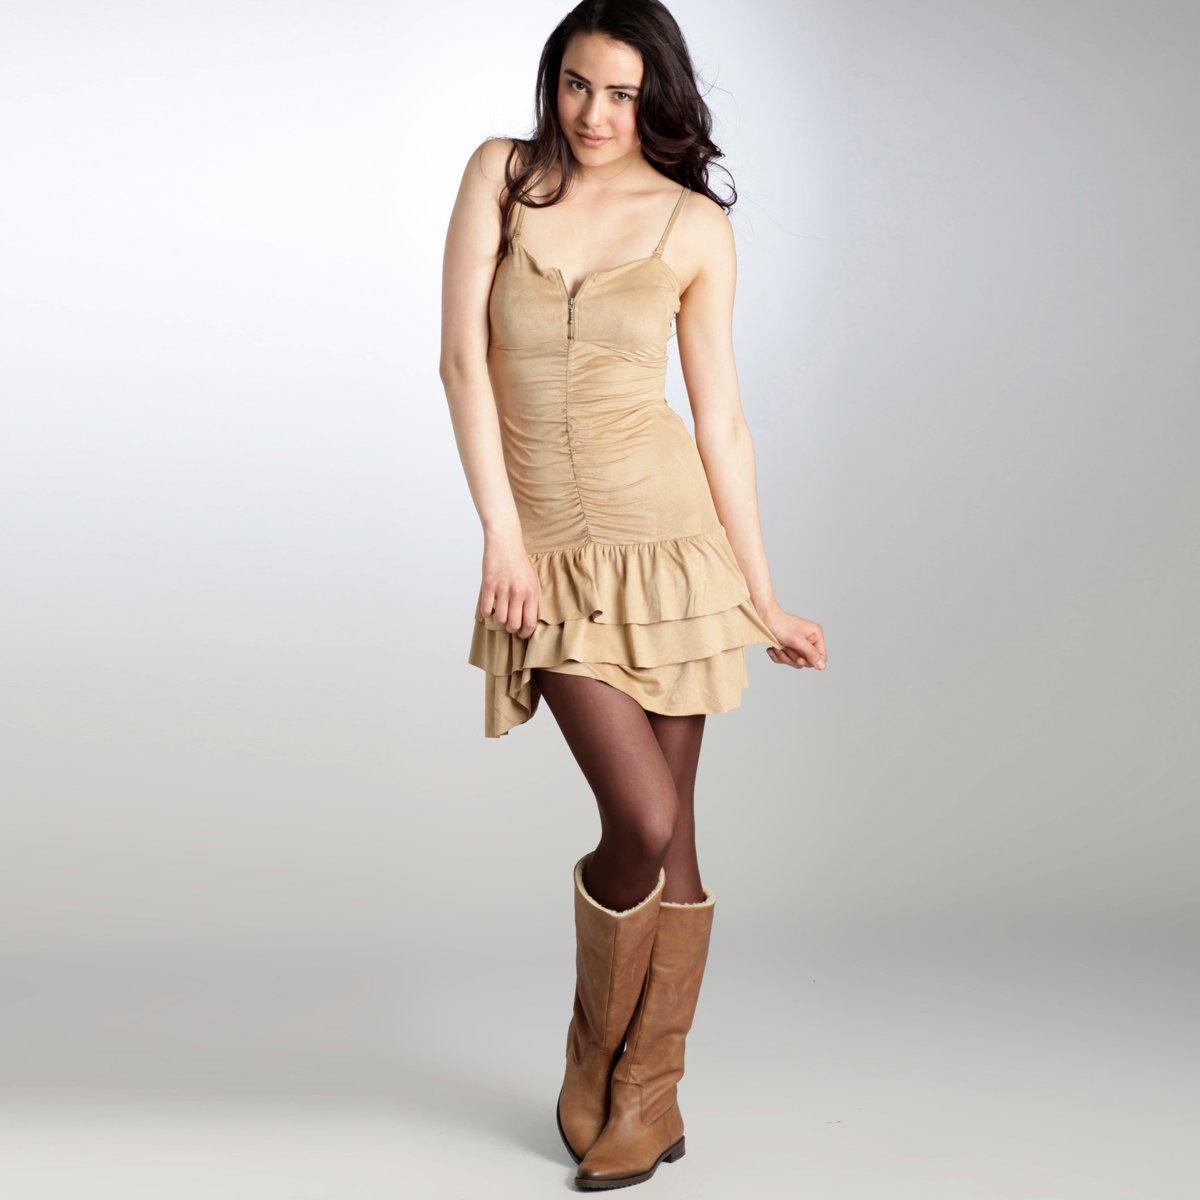 ebe25f1c813c Βραδυνα Φορεματα LaRedoute Φθινόπωρο 2011 Κωδ. 324209945